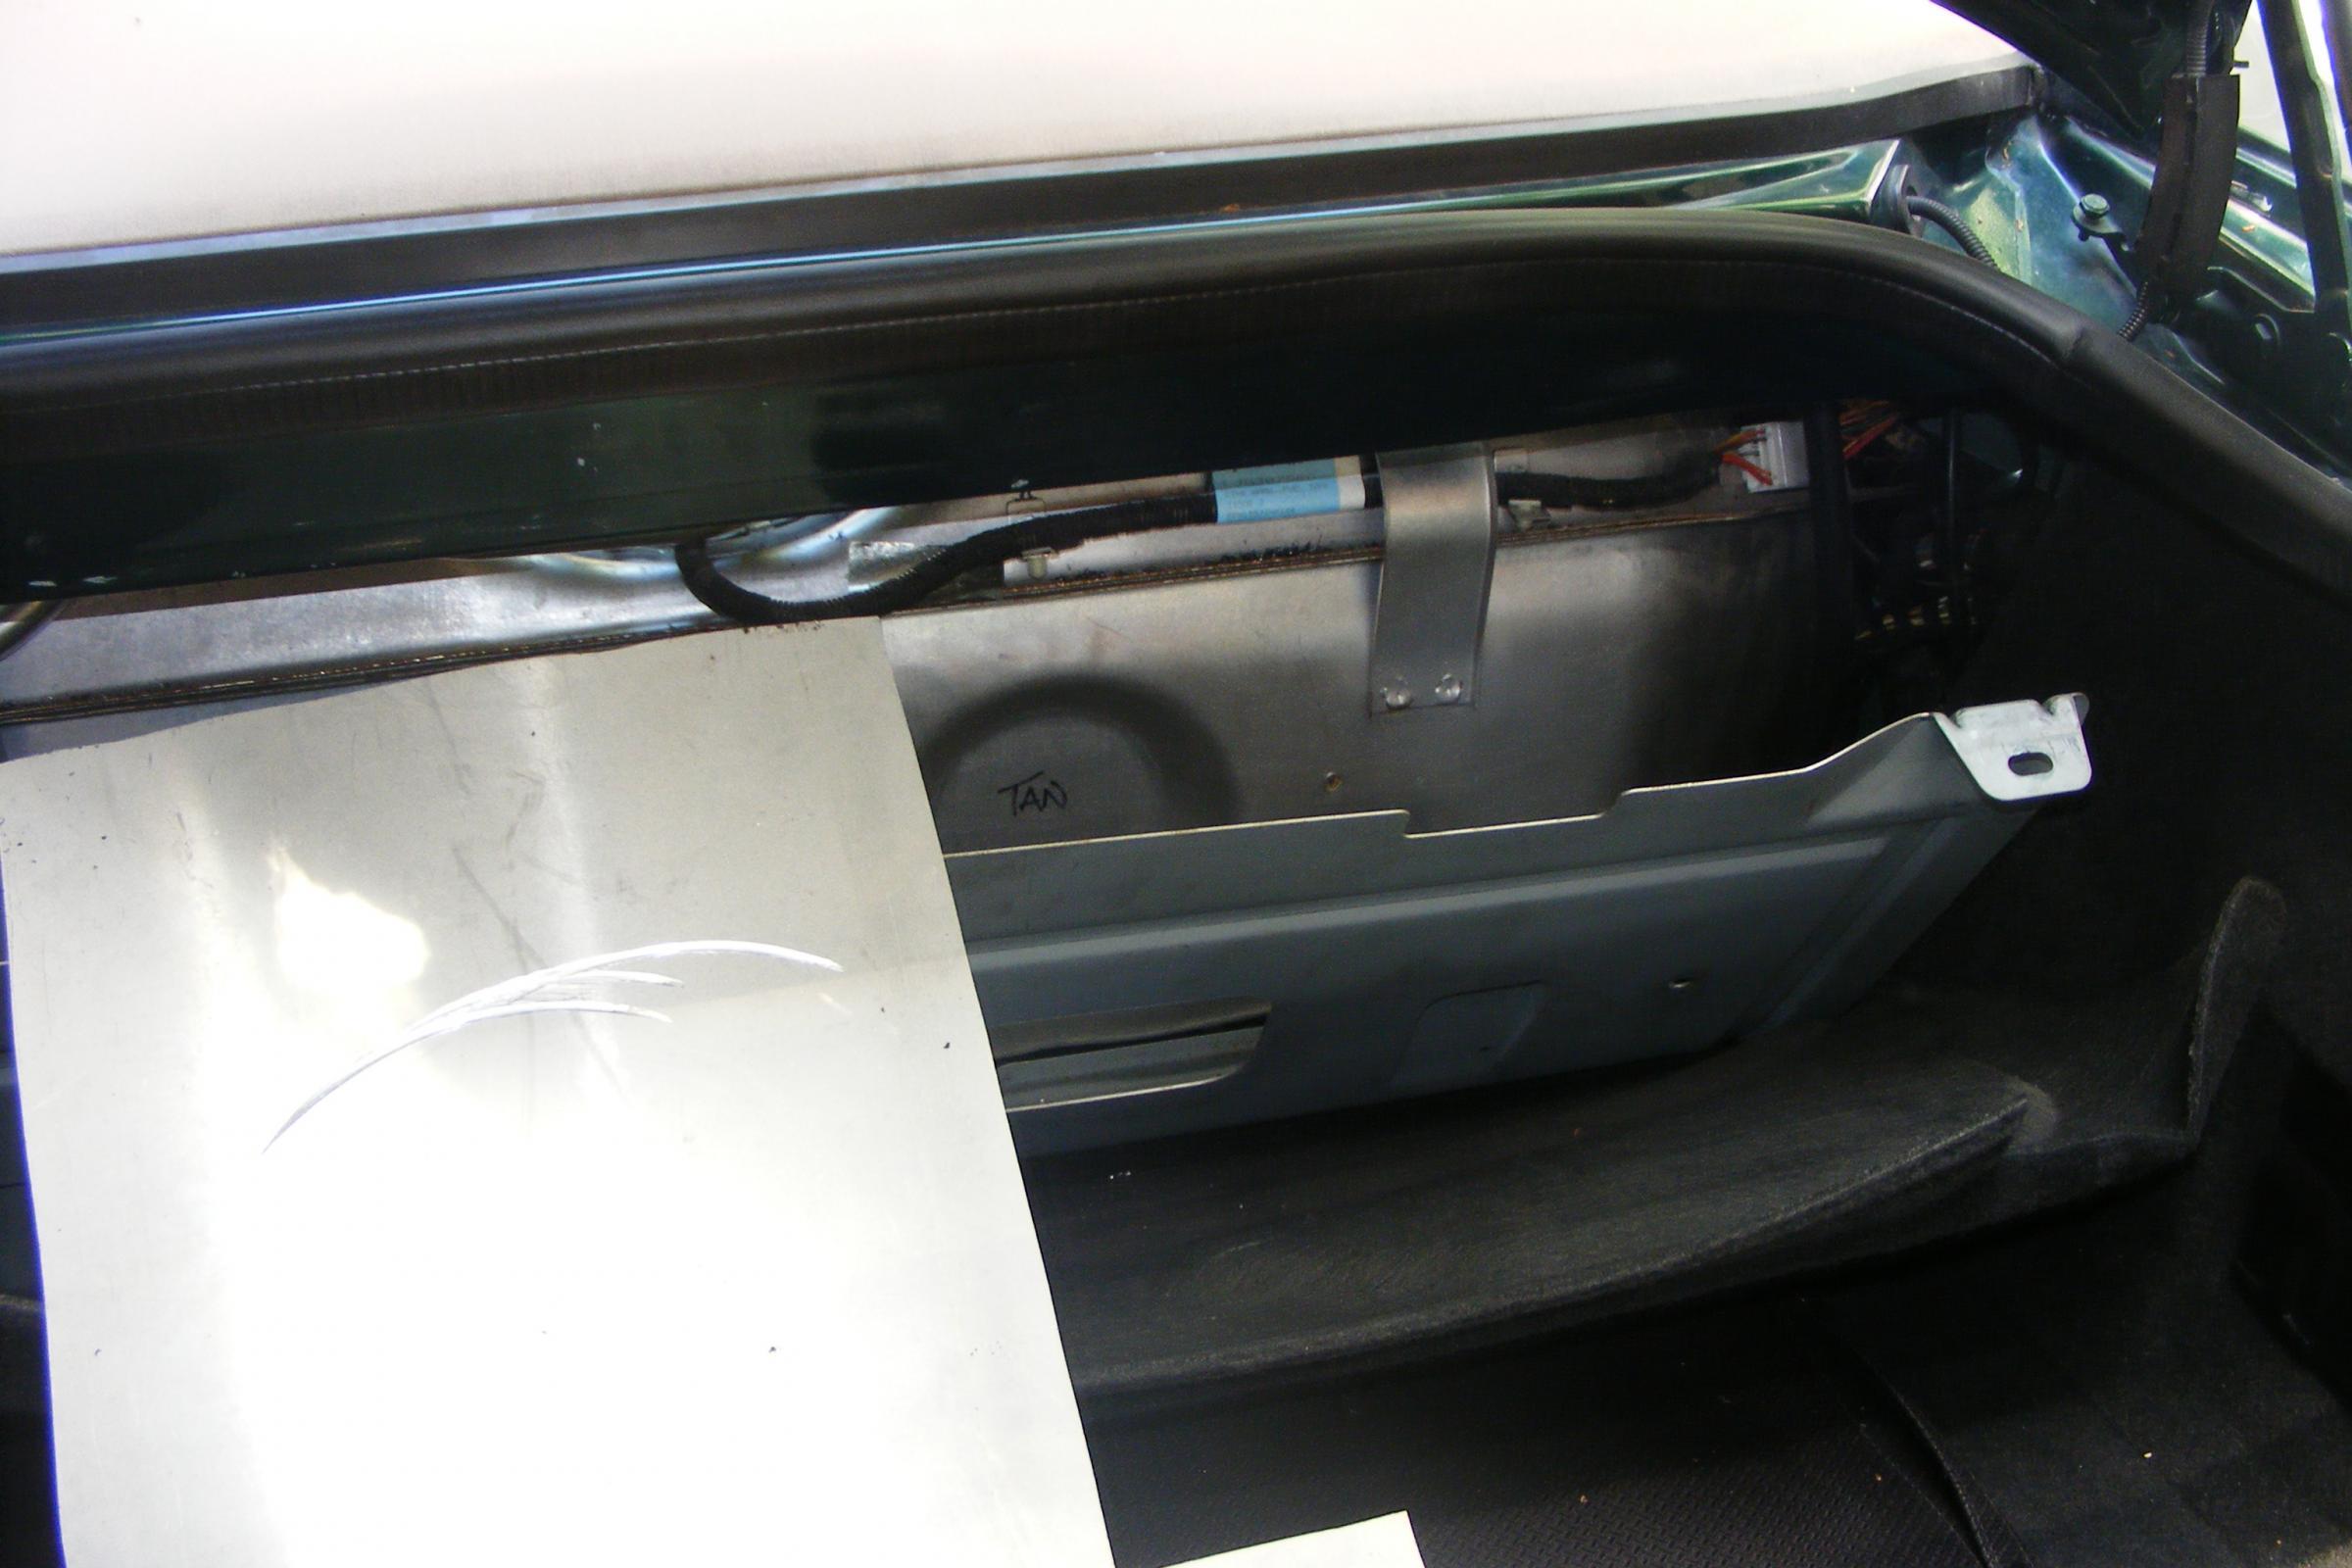 2002 Xk8 Fuel Pump Wiring Diagram 2001 Jaguar Xj8 Wiring Diagram